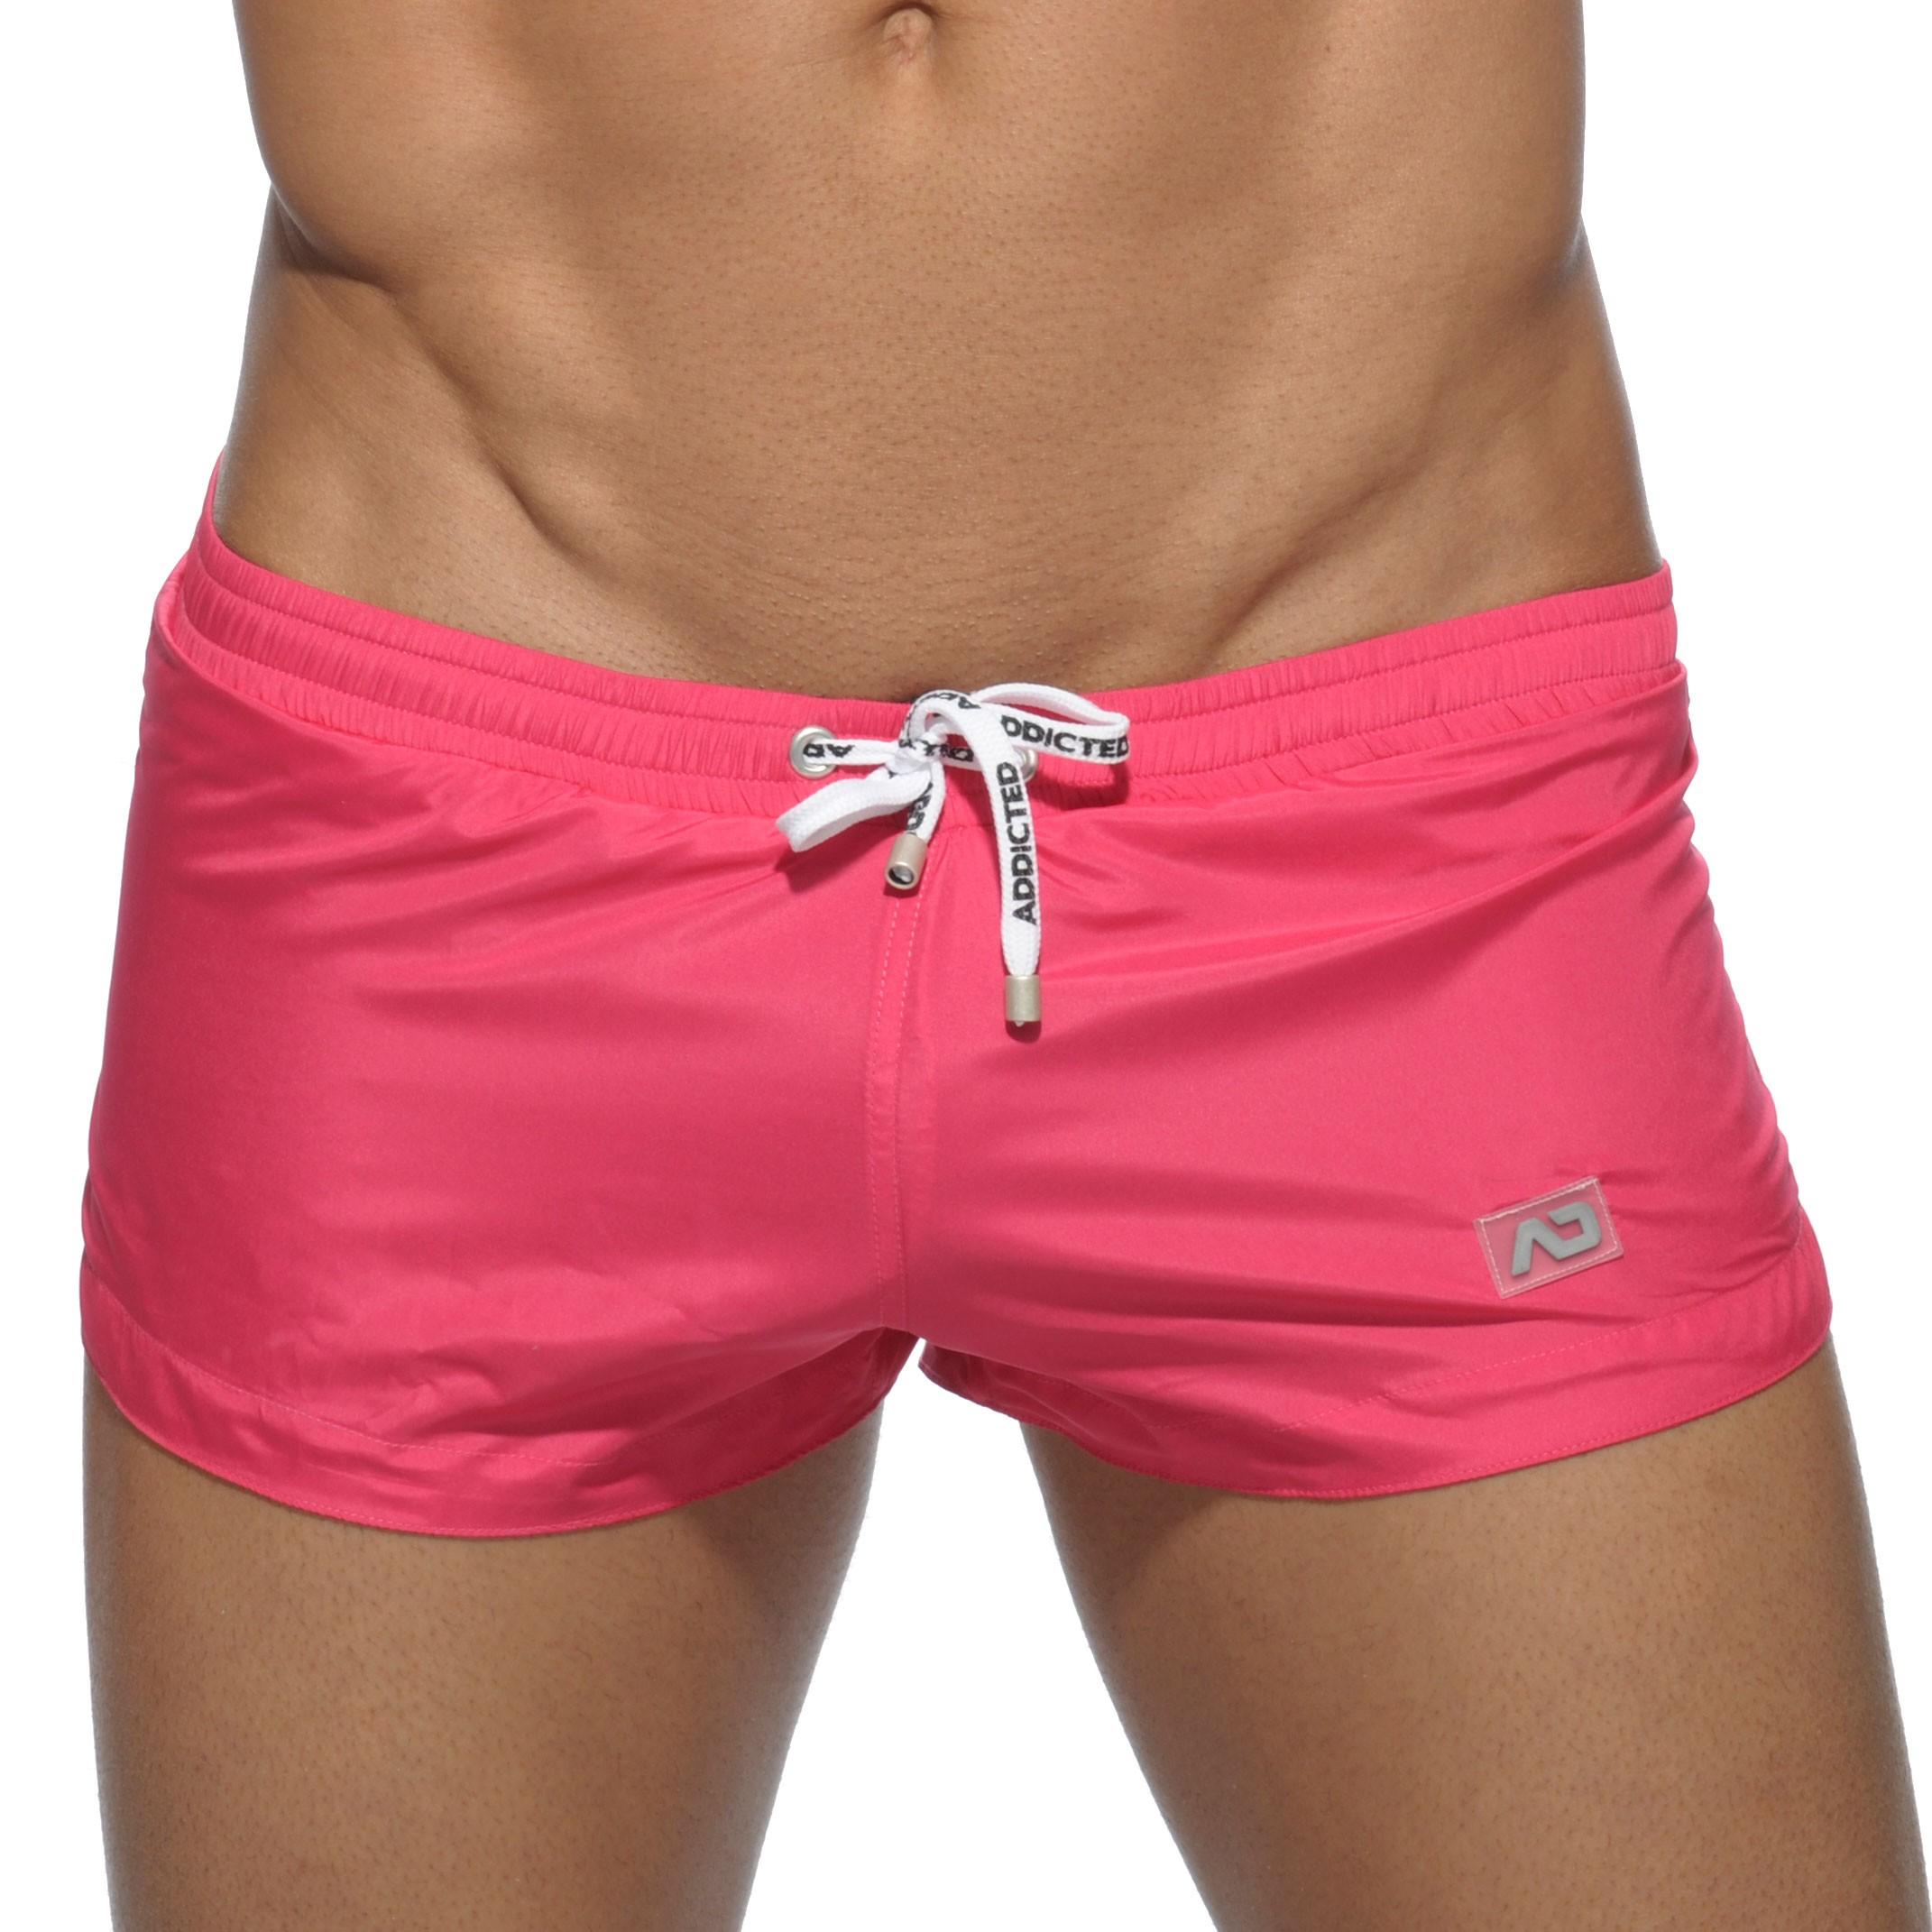 95230ac9ef405 Mini bath shorts basic pink - ADDICTED : sale of Bath Shorts for me...